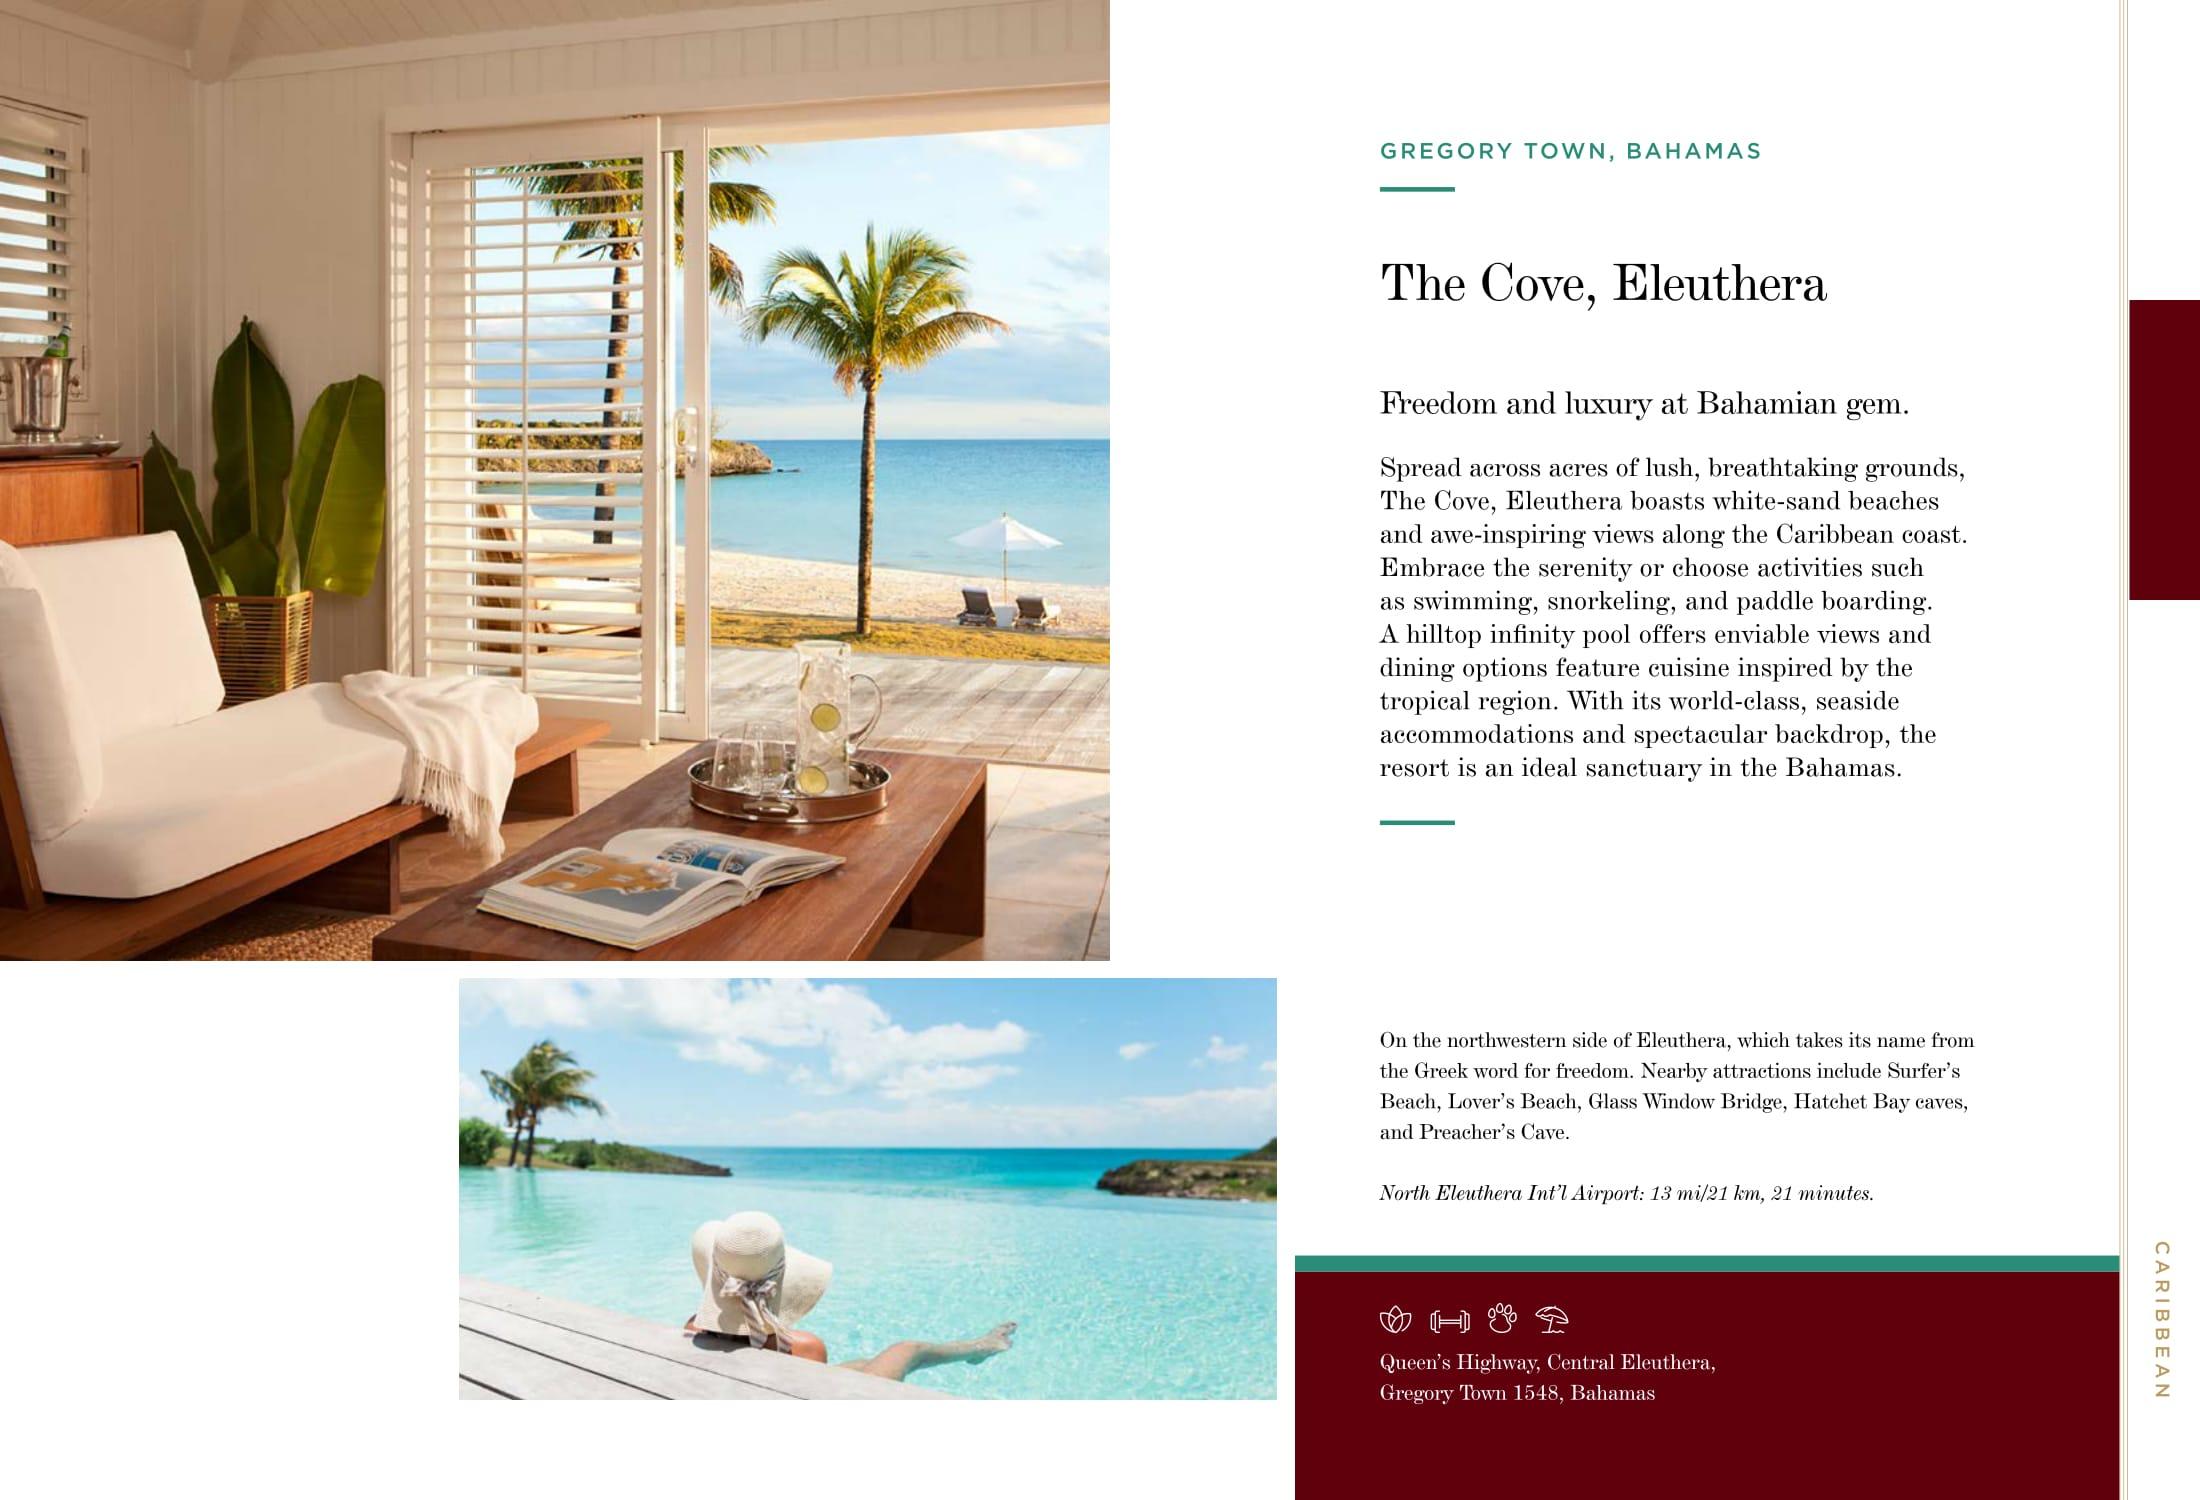 The Cove, Eleuthera, Bahamas